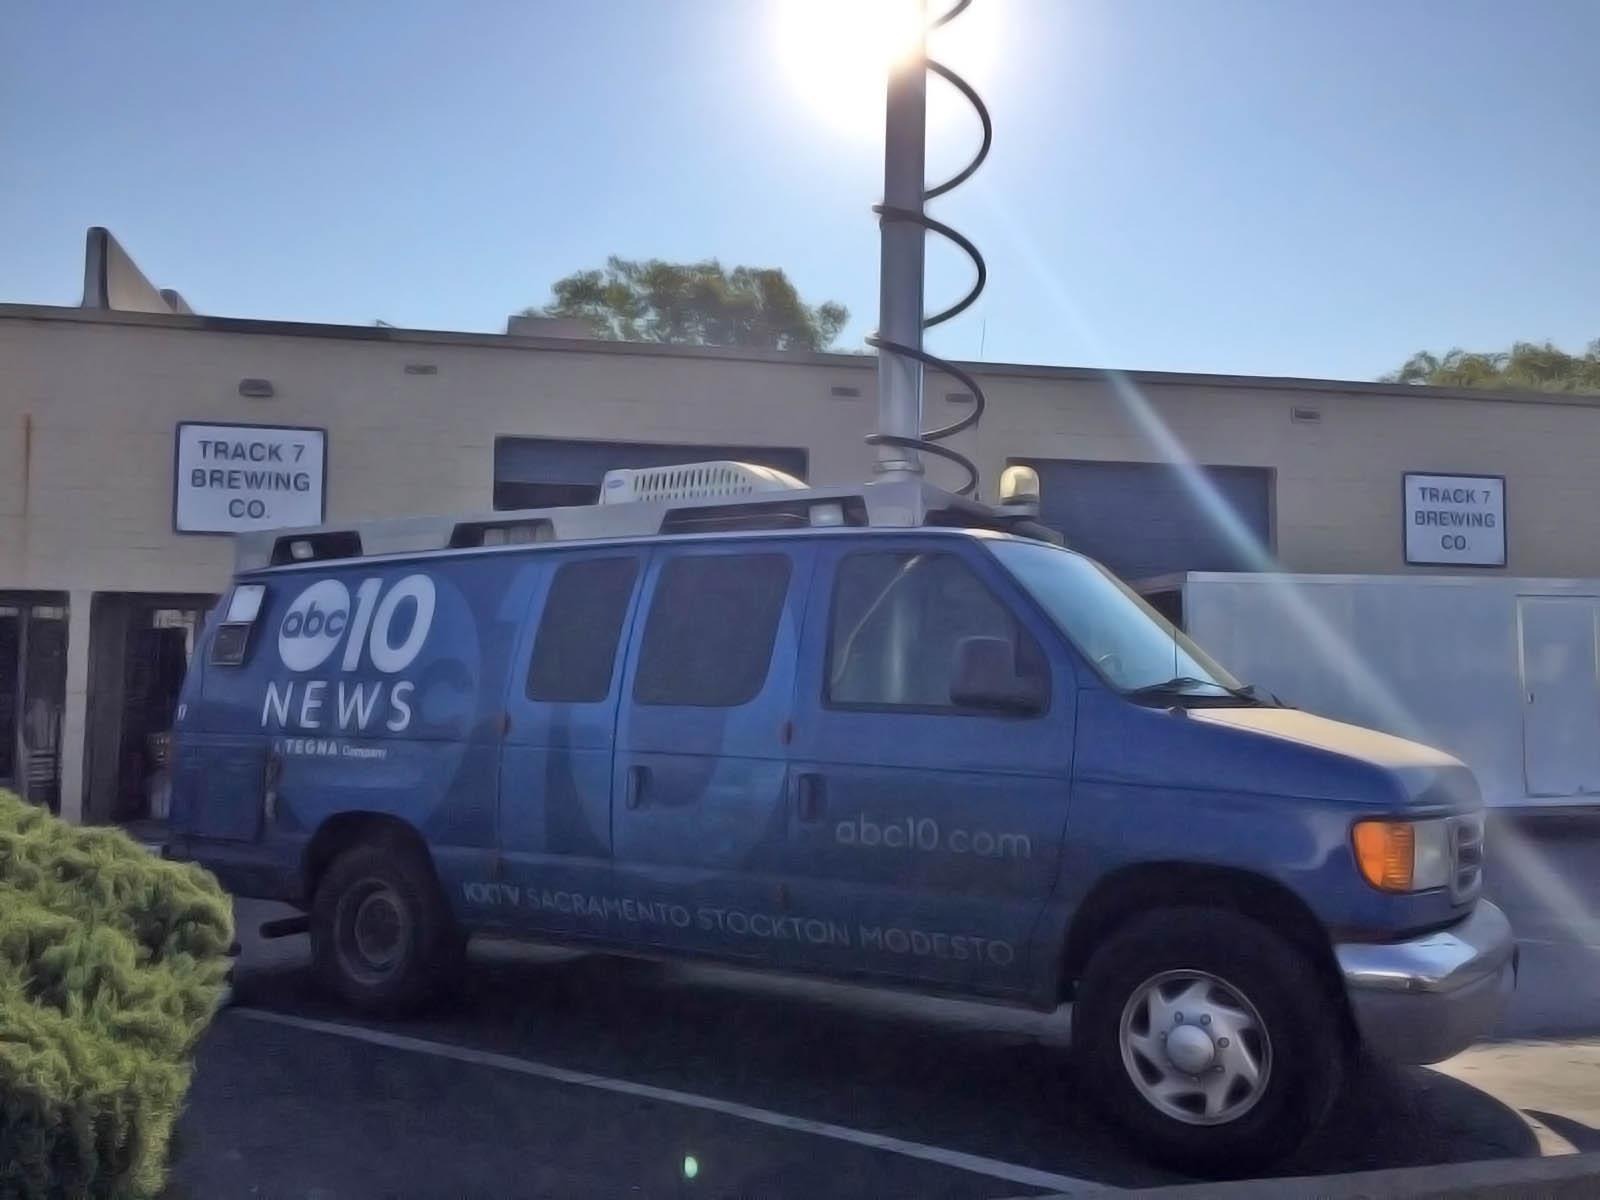 ABC 10 News Sacramento's Van for Live Coverage